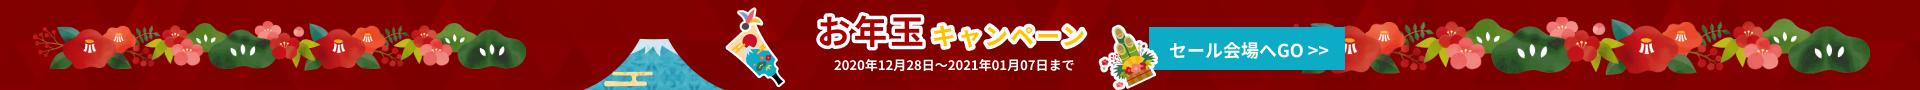 DVD Memoryキャンペーン